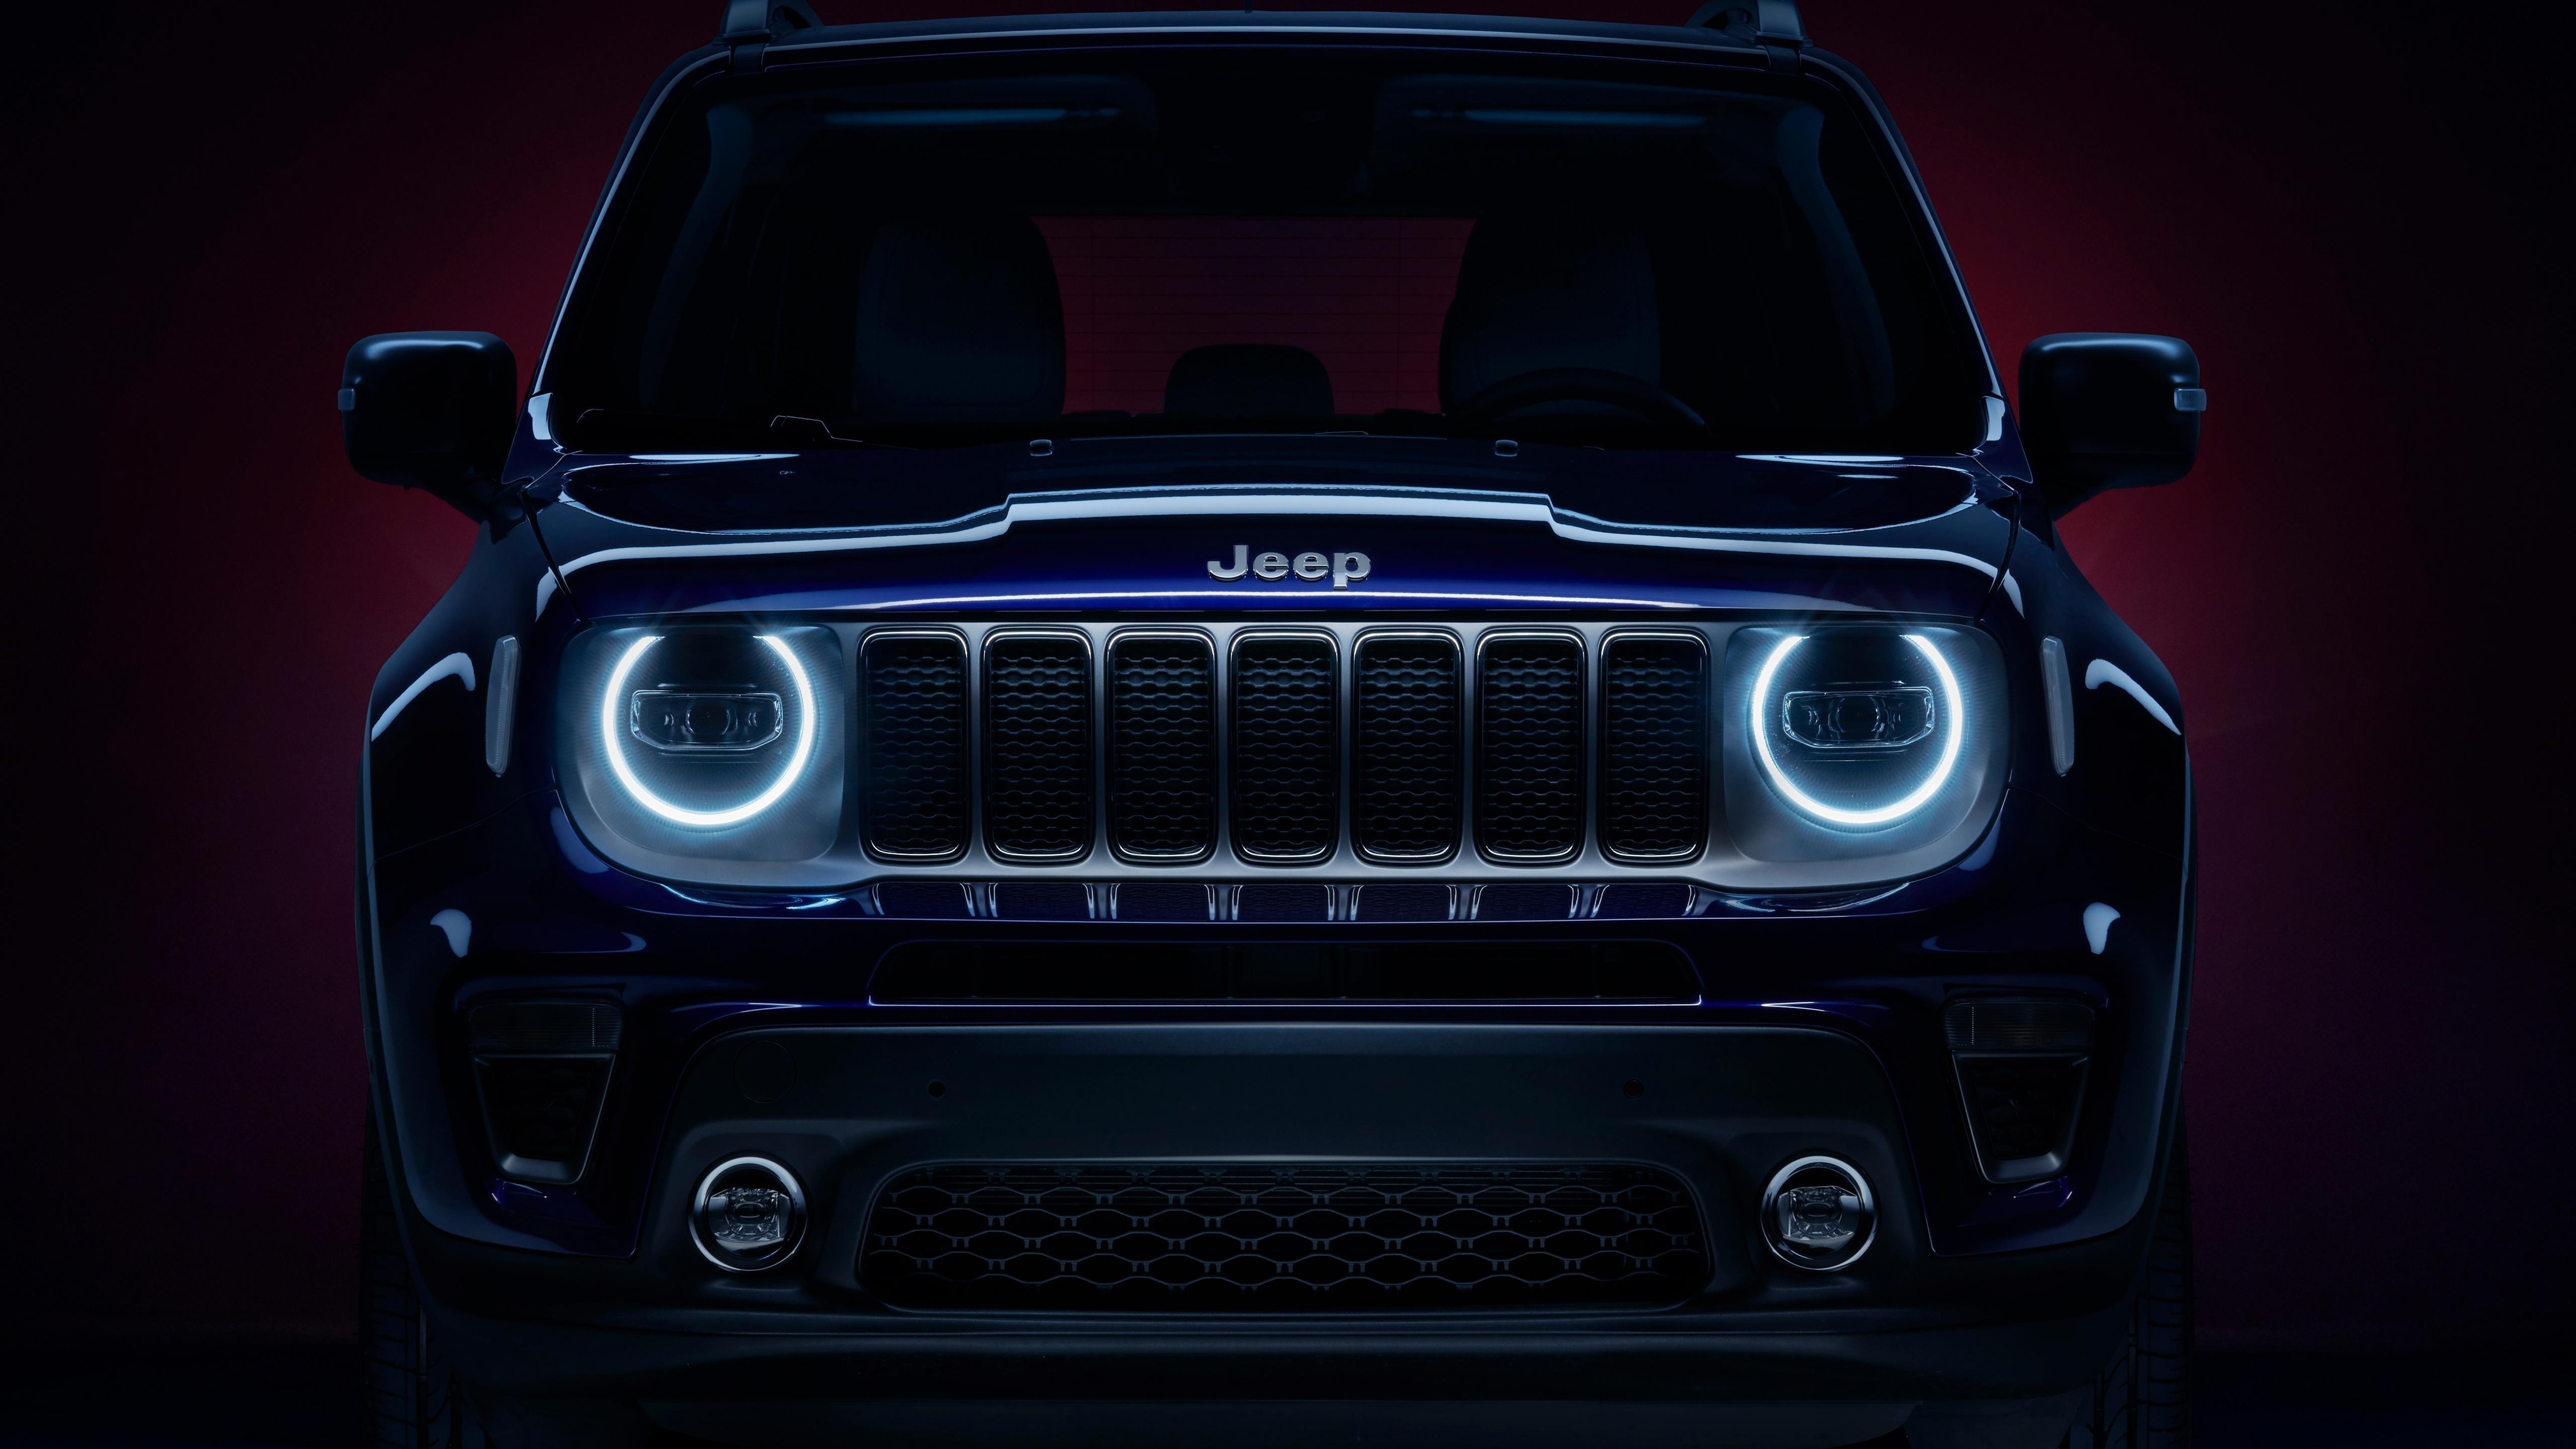 Jeep renegade limited 2019 обои скачать